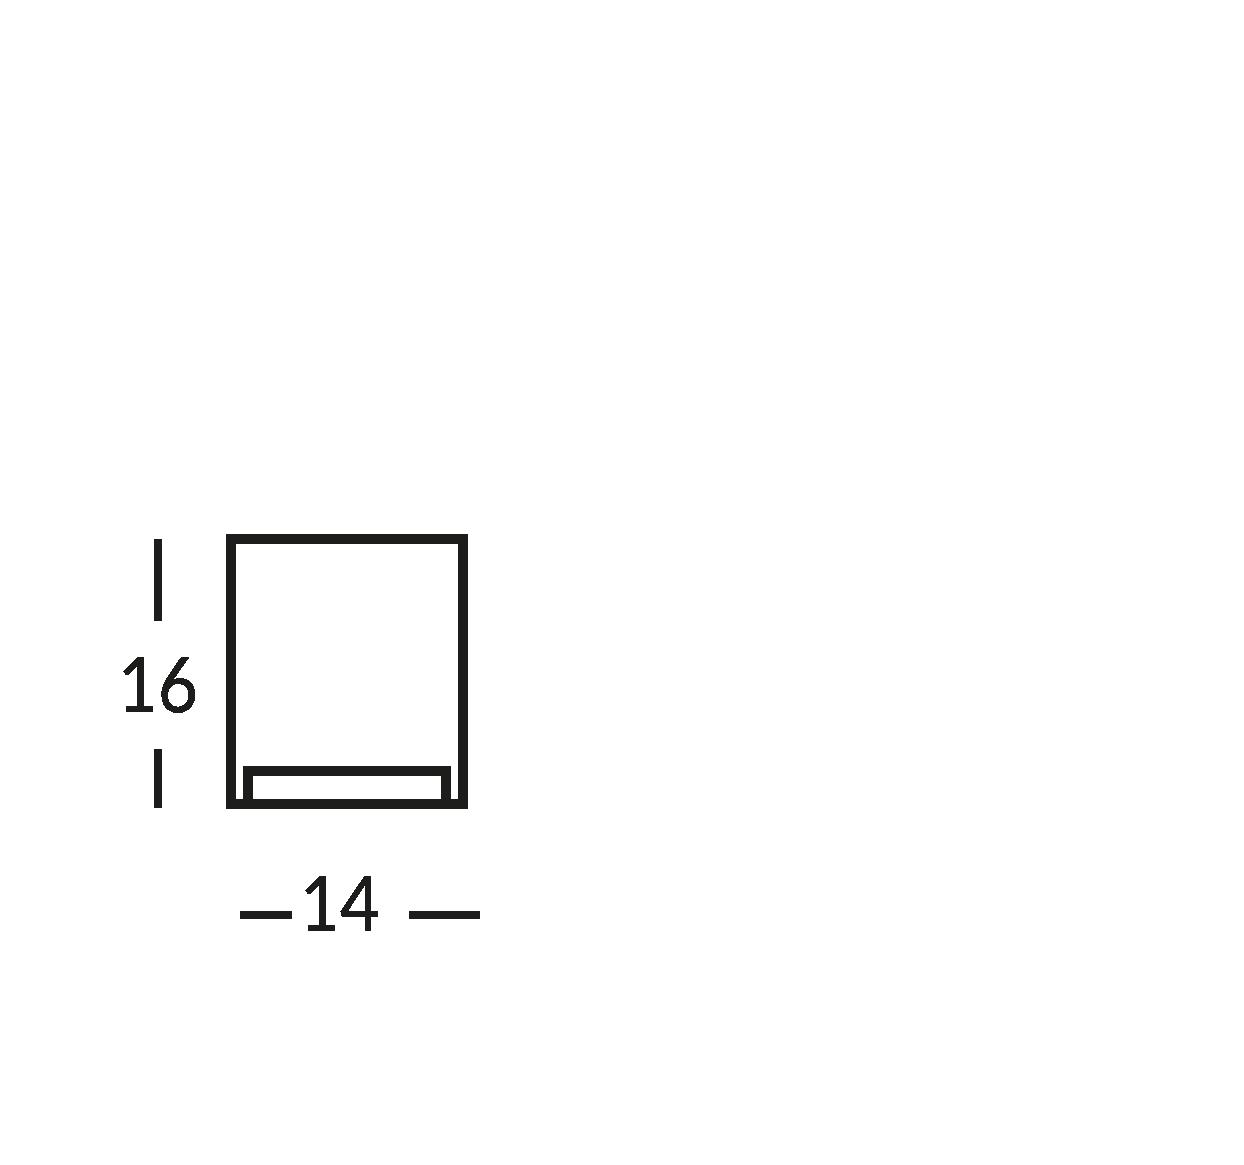 Señal impresa en cristal transparente. cm 14x16